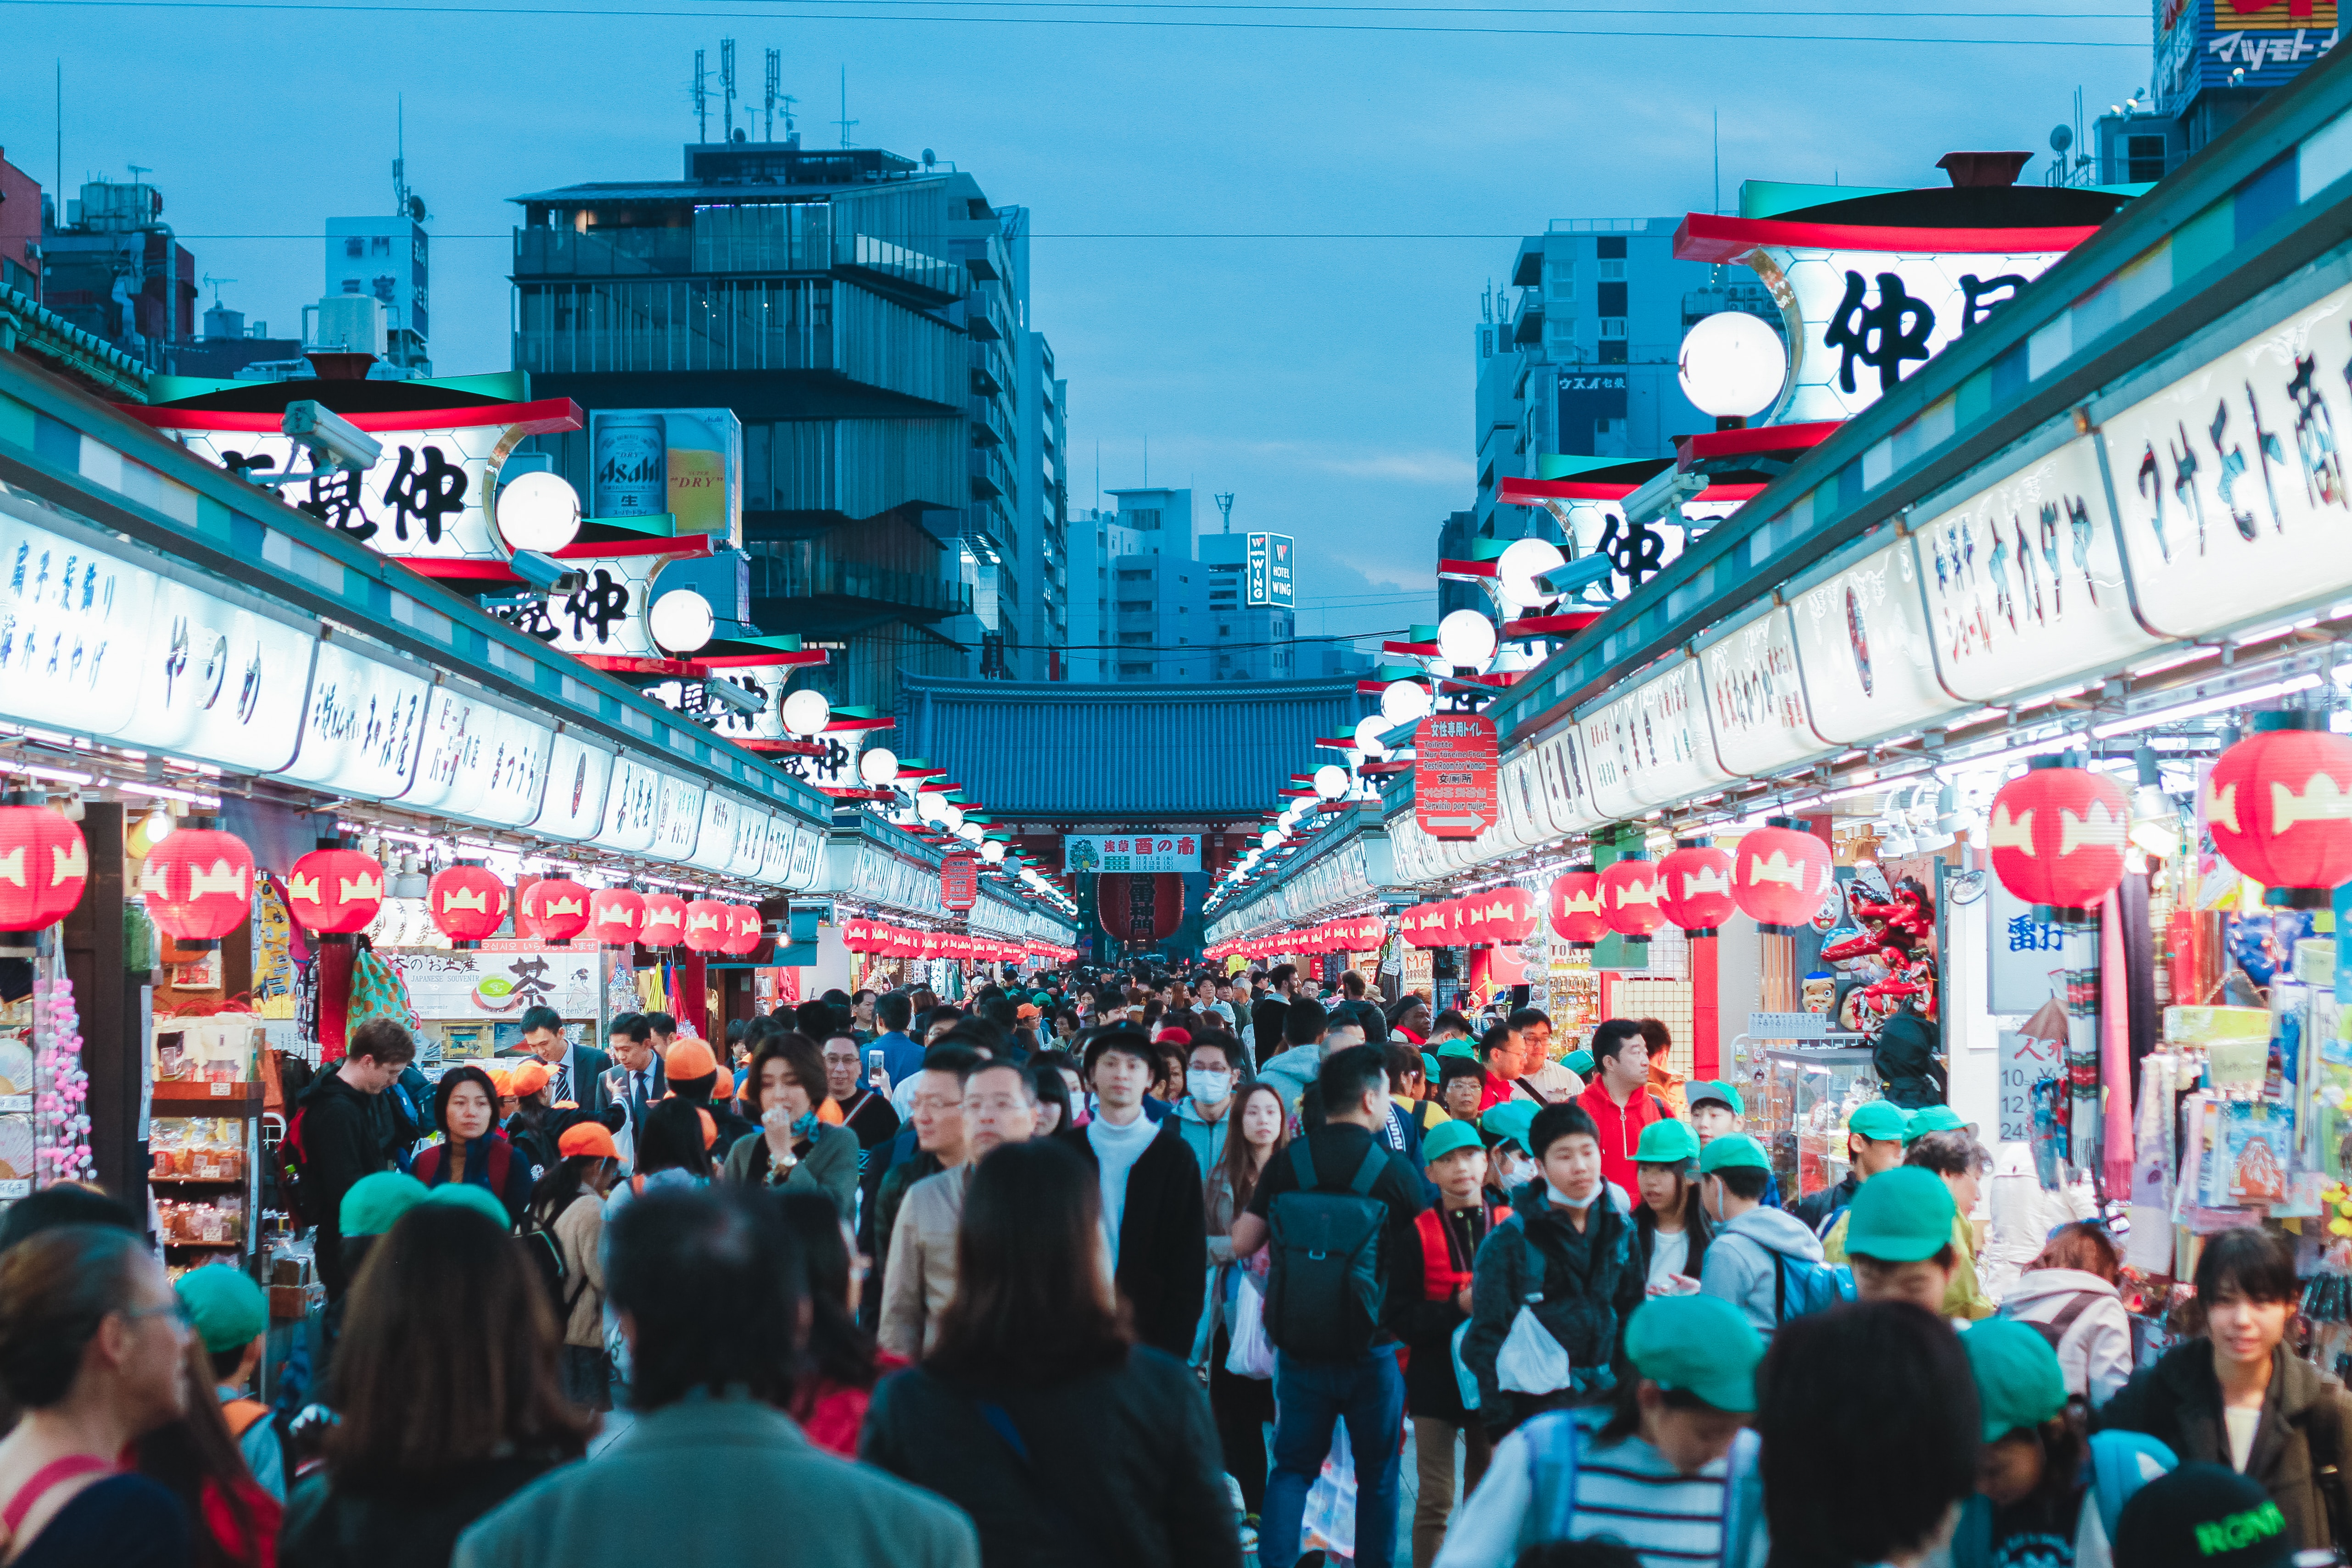 crowds of people walking around outdoor market in tokyo at night